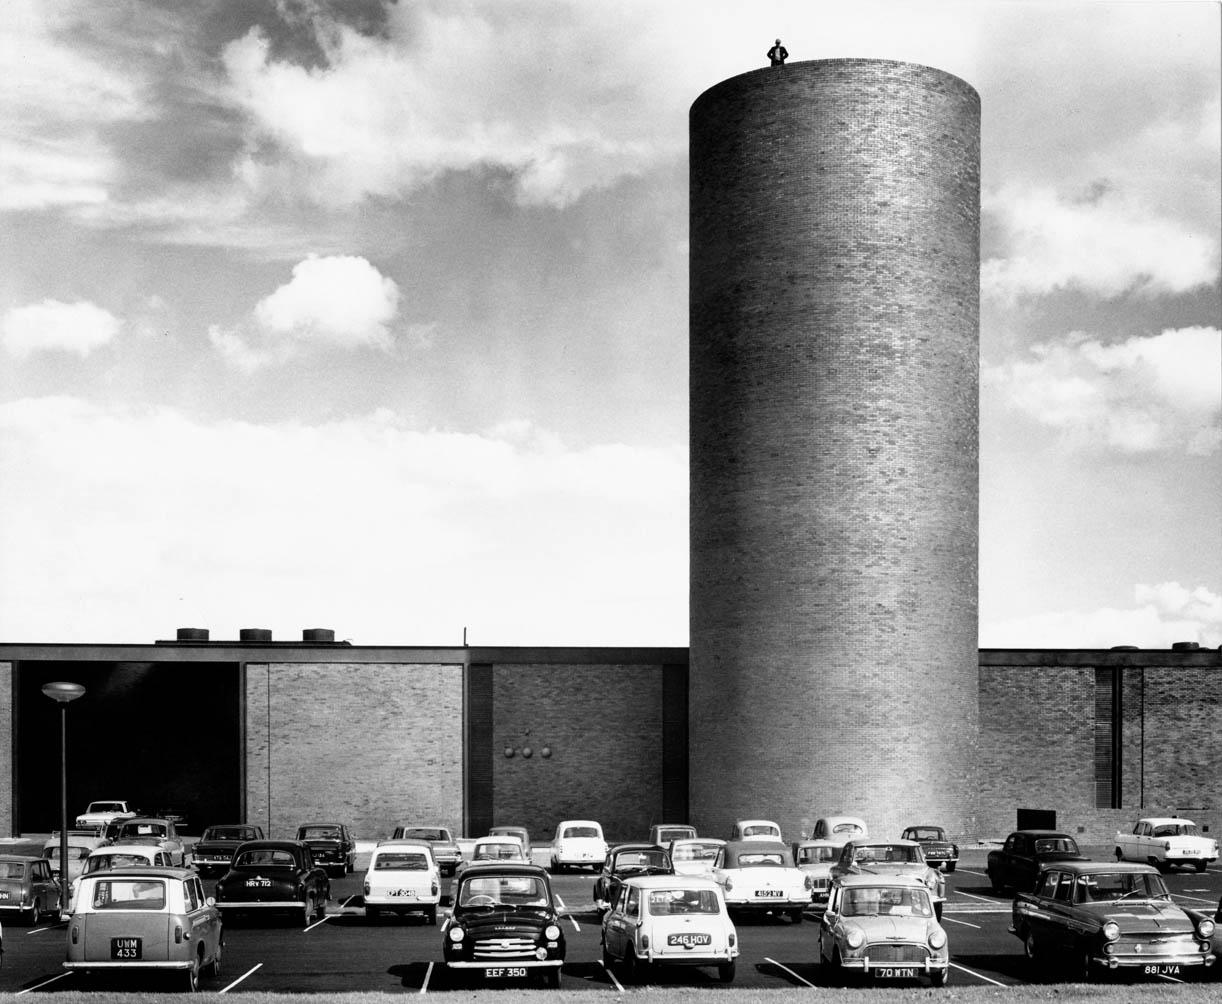 Cummins Diesel Engines >> Cummins Engine Plant - Something Concrete + Modern